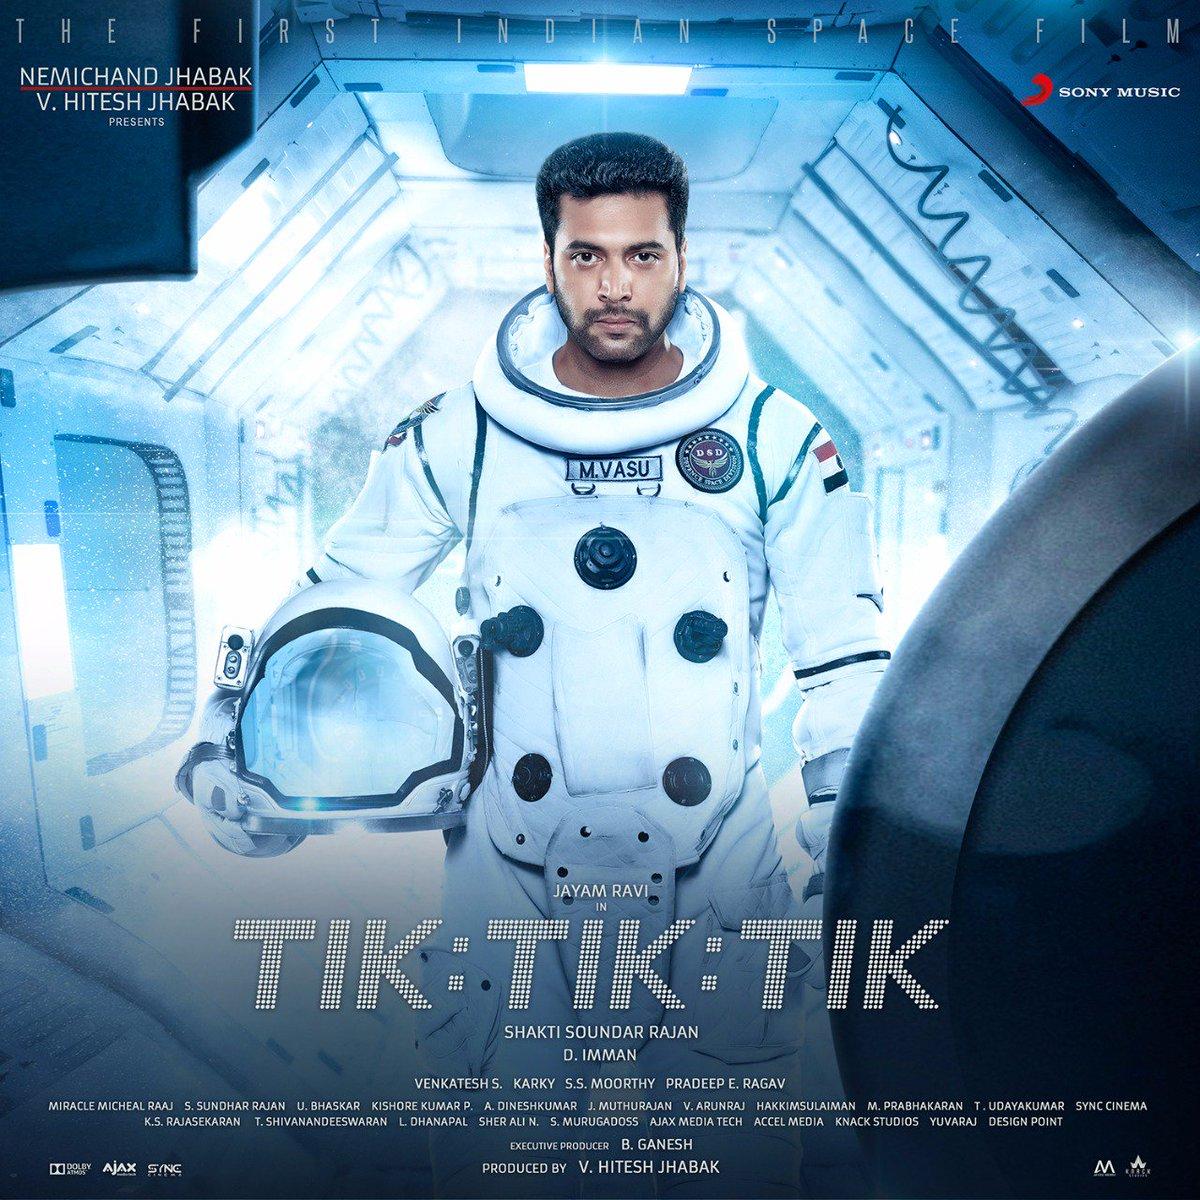 A year of India's first-ever space film and only soaring higher! 🚀💥  Reminiscing #1YearOfTikTikTik with the stellar album right here ➡️  http://bit.ly/TikTikTikPlaylist…  @actor_jayamravi @ShaktiRajan @immancomposer @JabaksMovies #NivethaPethuraj @madhankarky   #DImman100